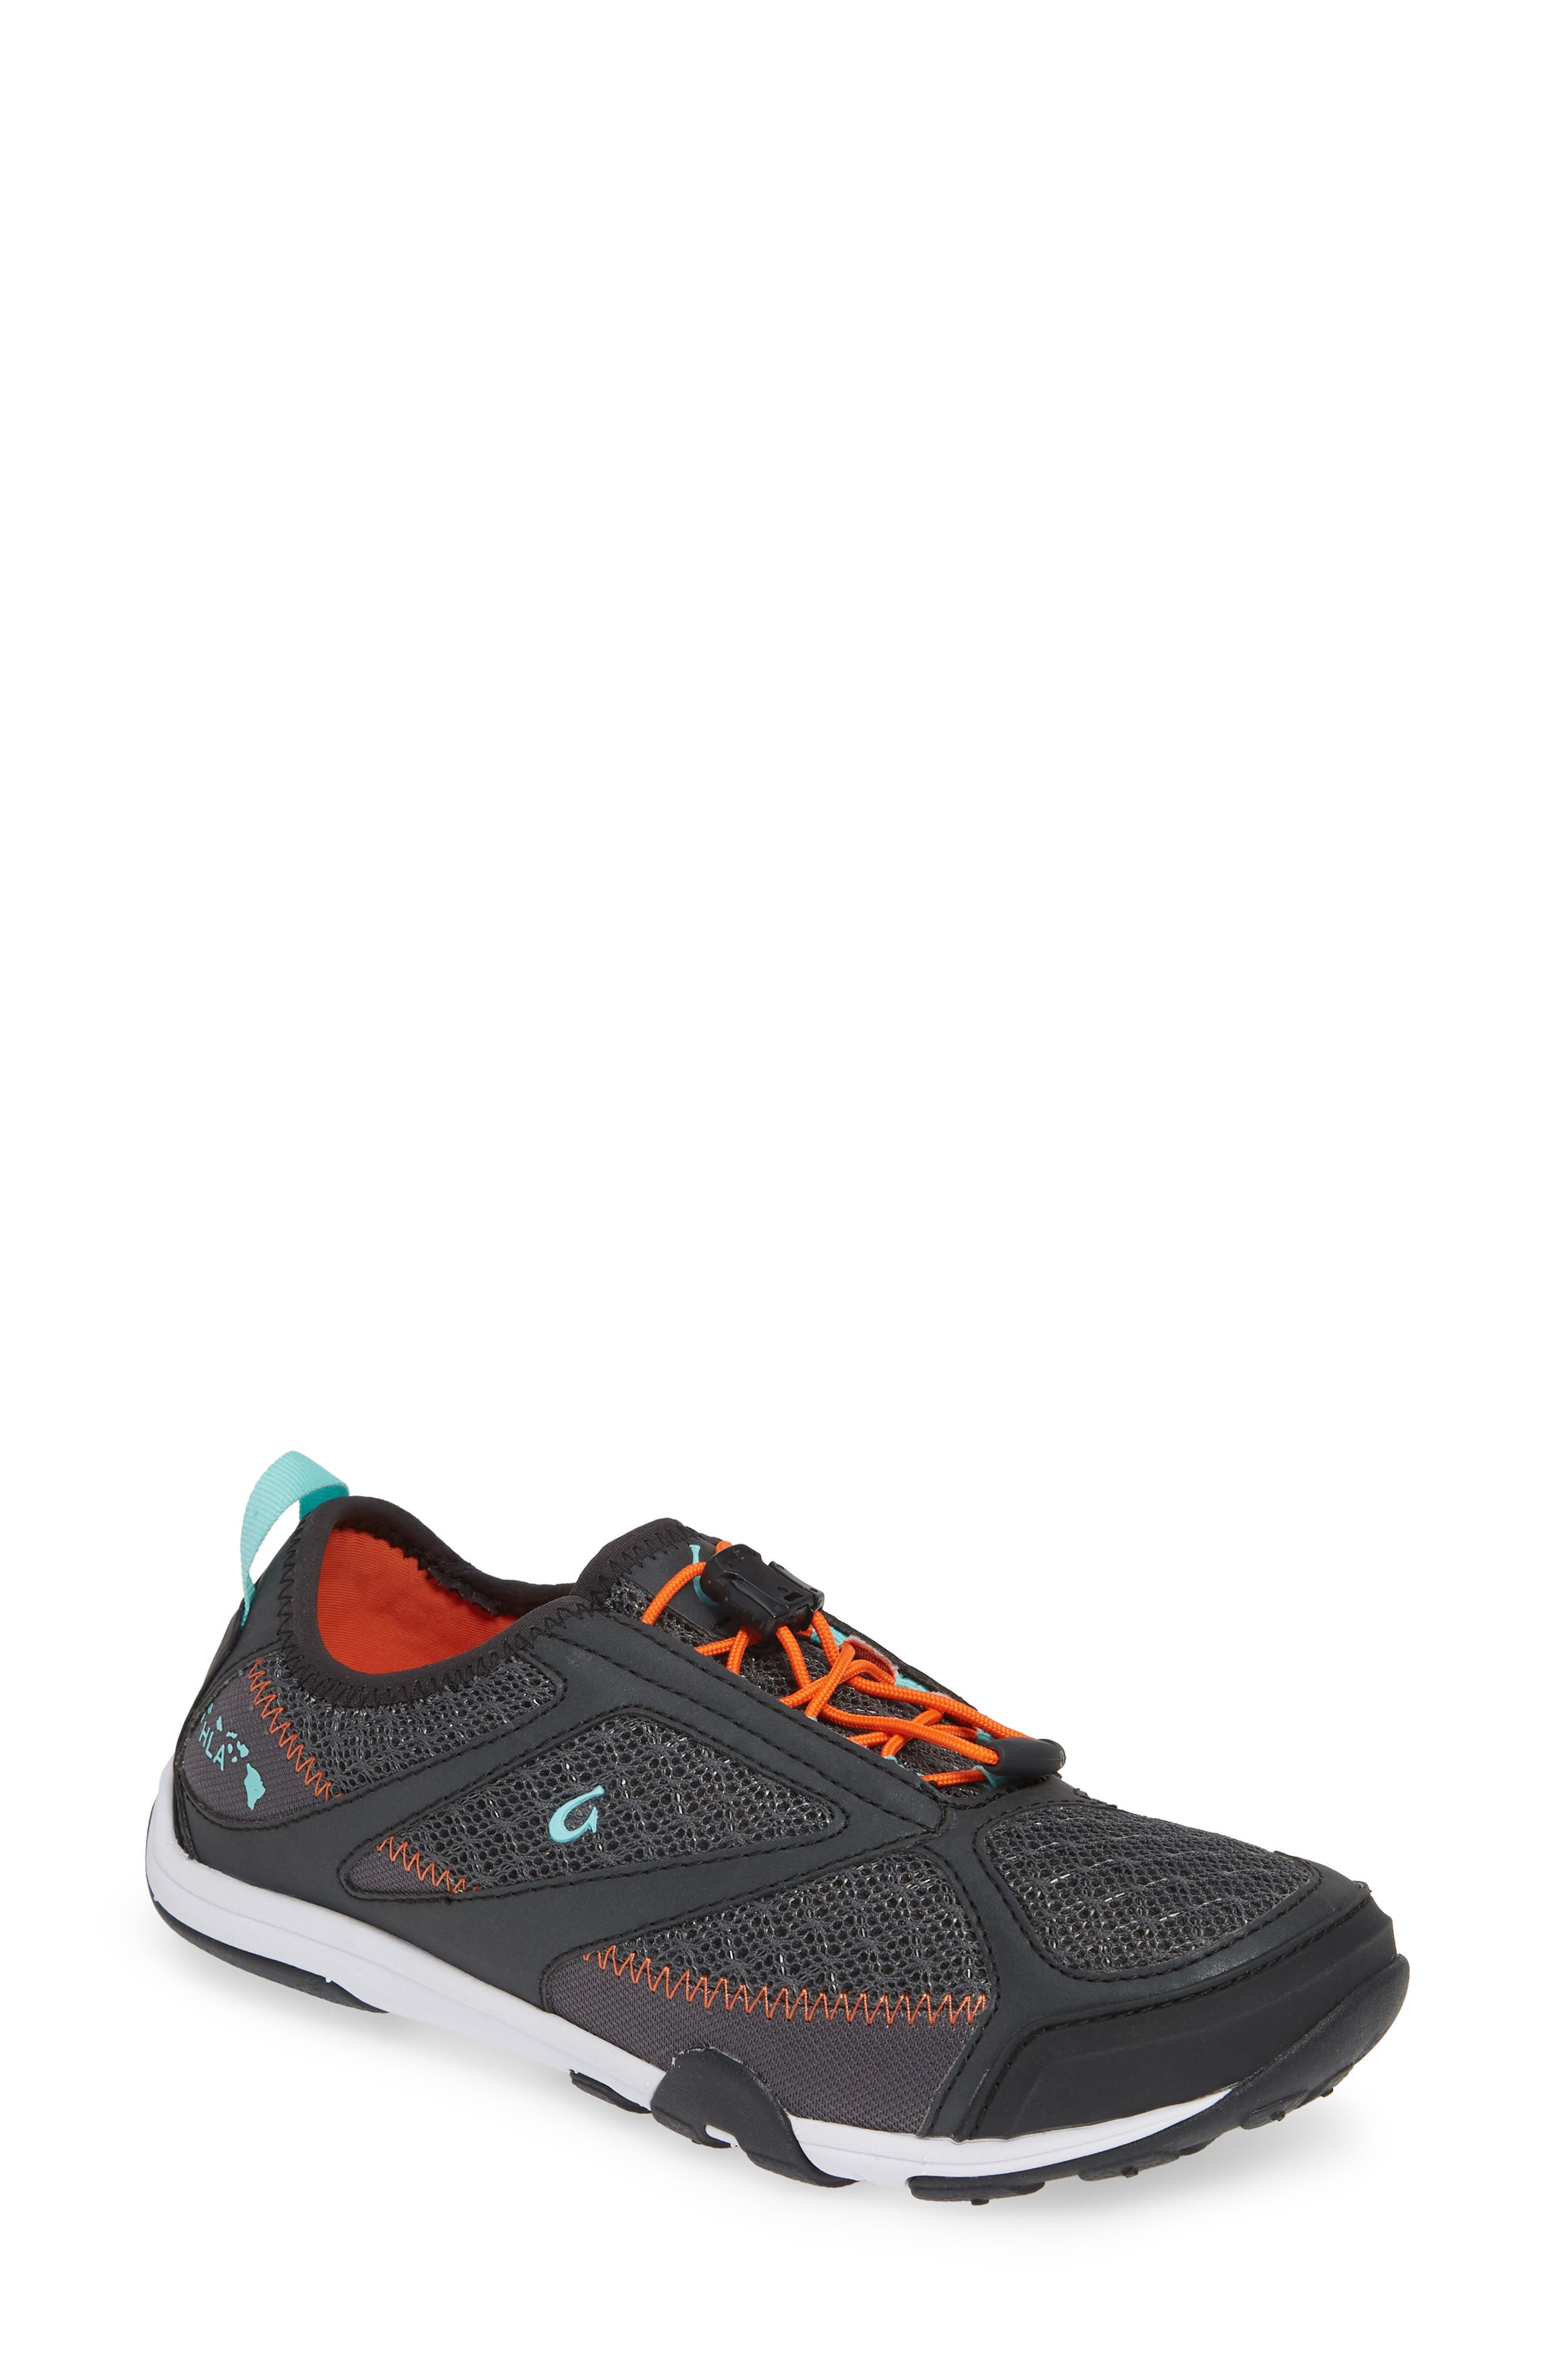 'Eleu' Water-Resistant Sneaker,                         Main,                         color, DARK SHADOW/ LAVA ROCK FABRIC